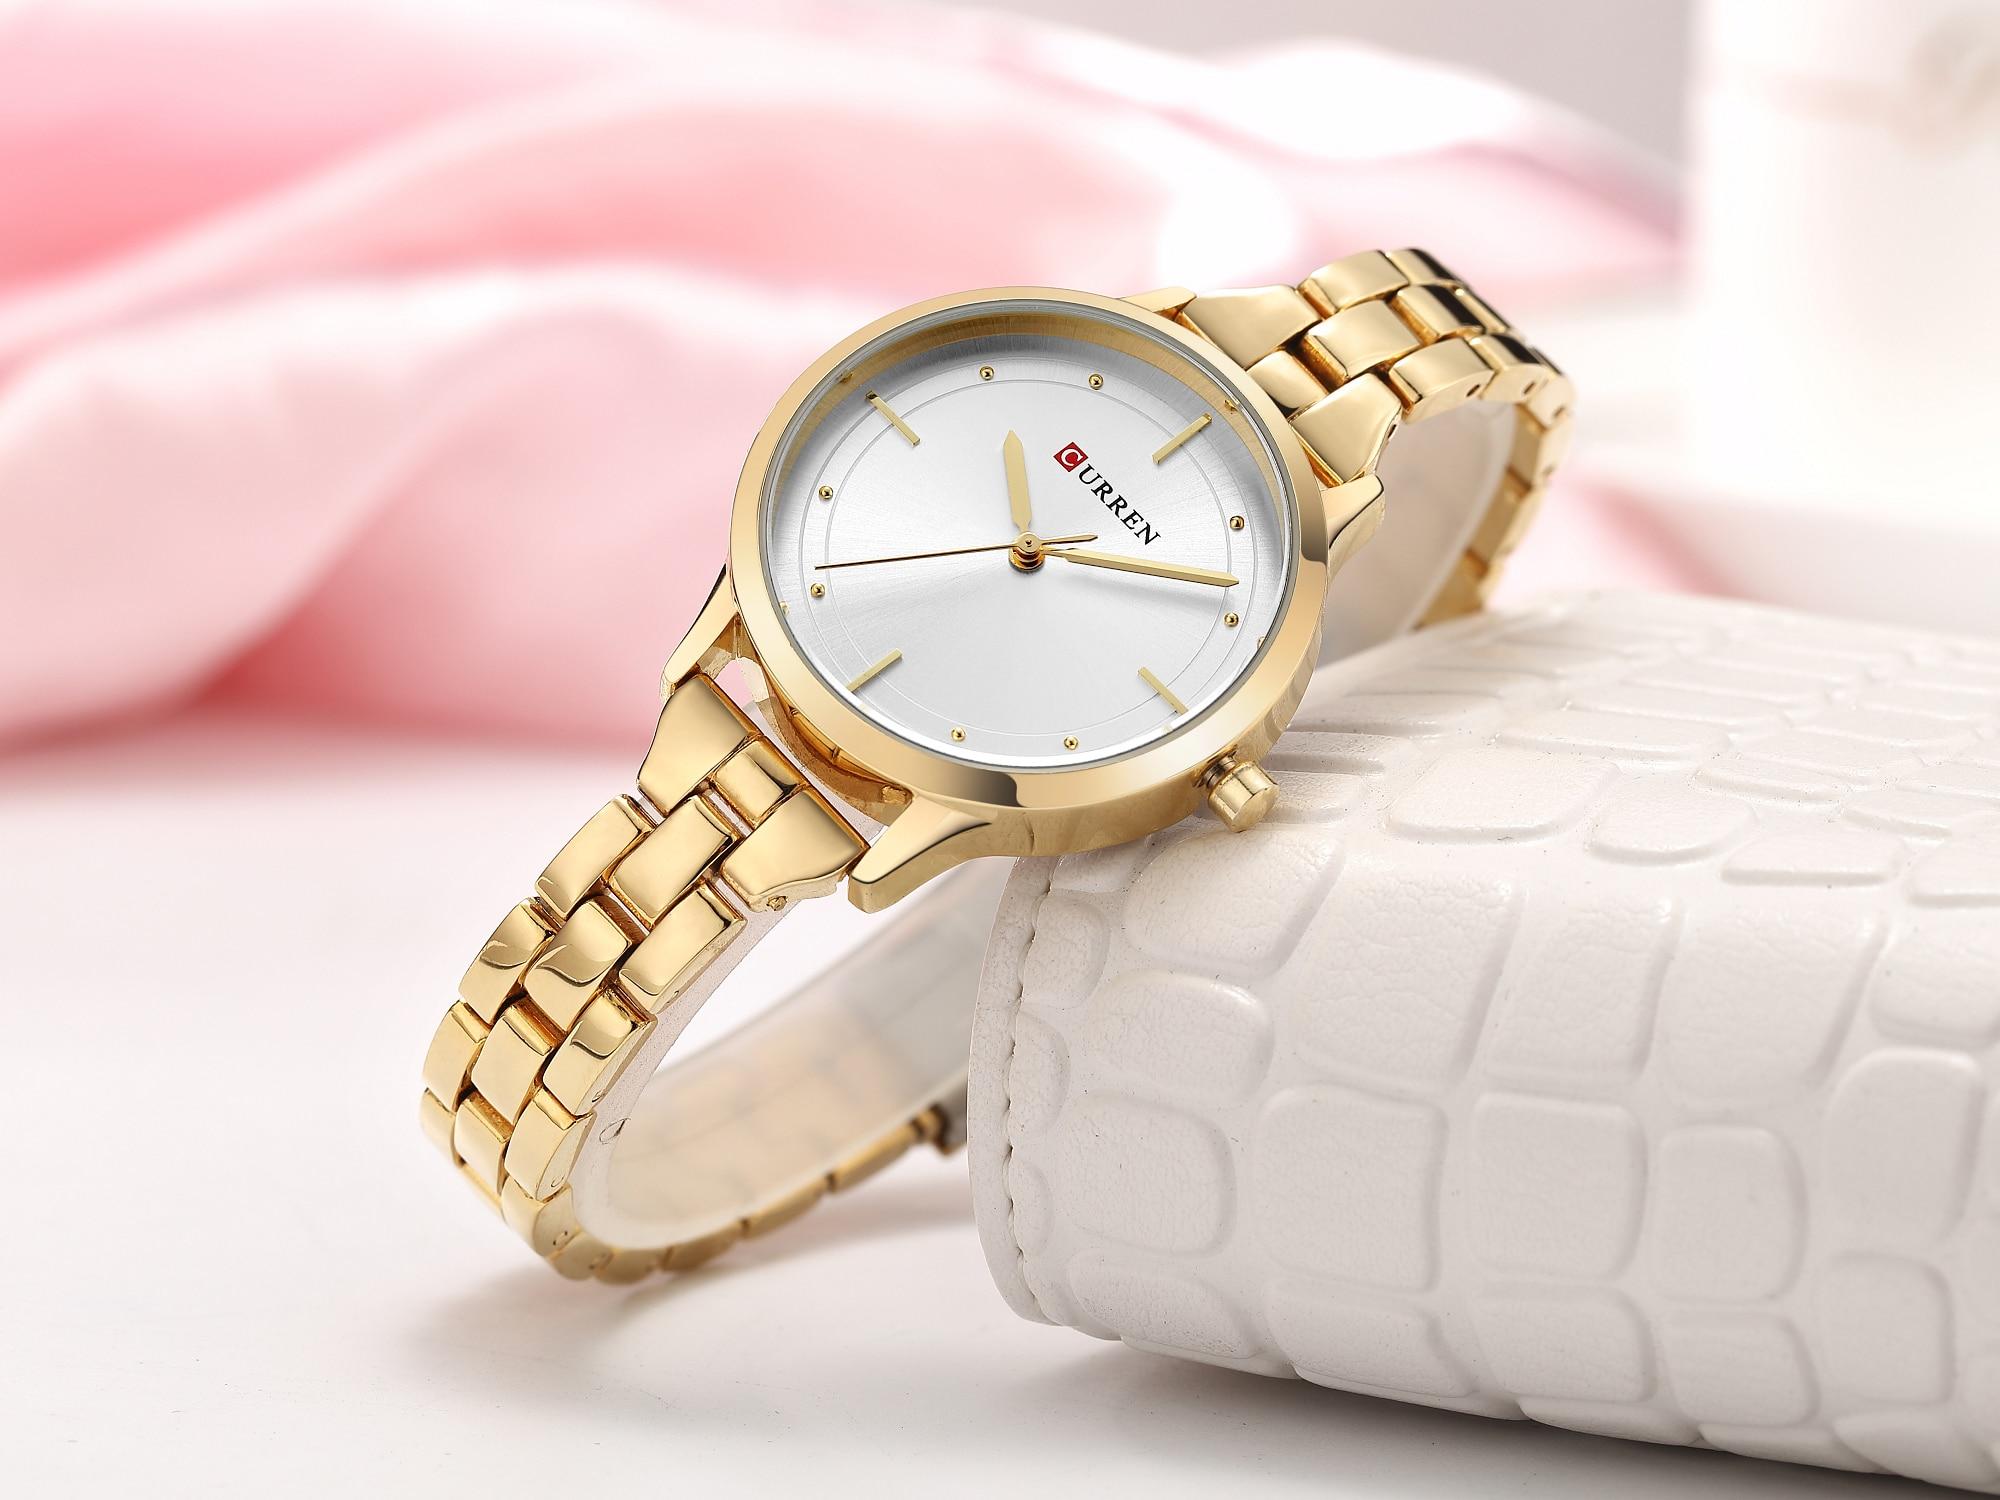 CURREN Female Watch Newest Fashion Design Women Wristwatches Gold Stainless Steel Quartz Relogio Waterproof Relojes Para Mujer enlarge